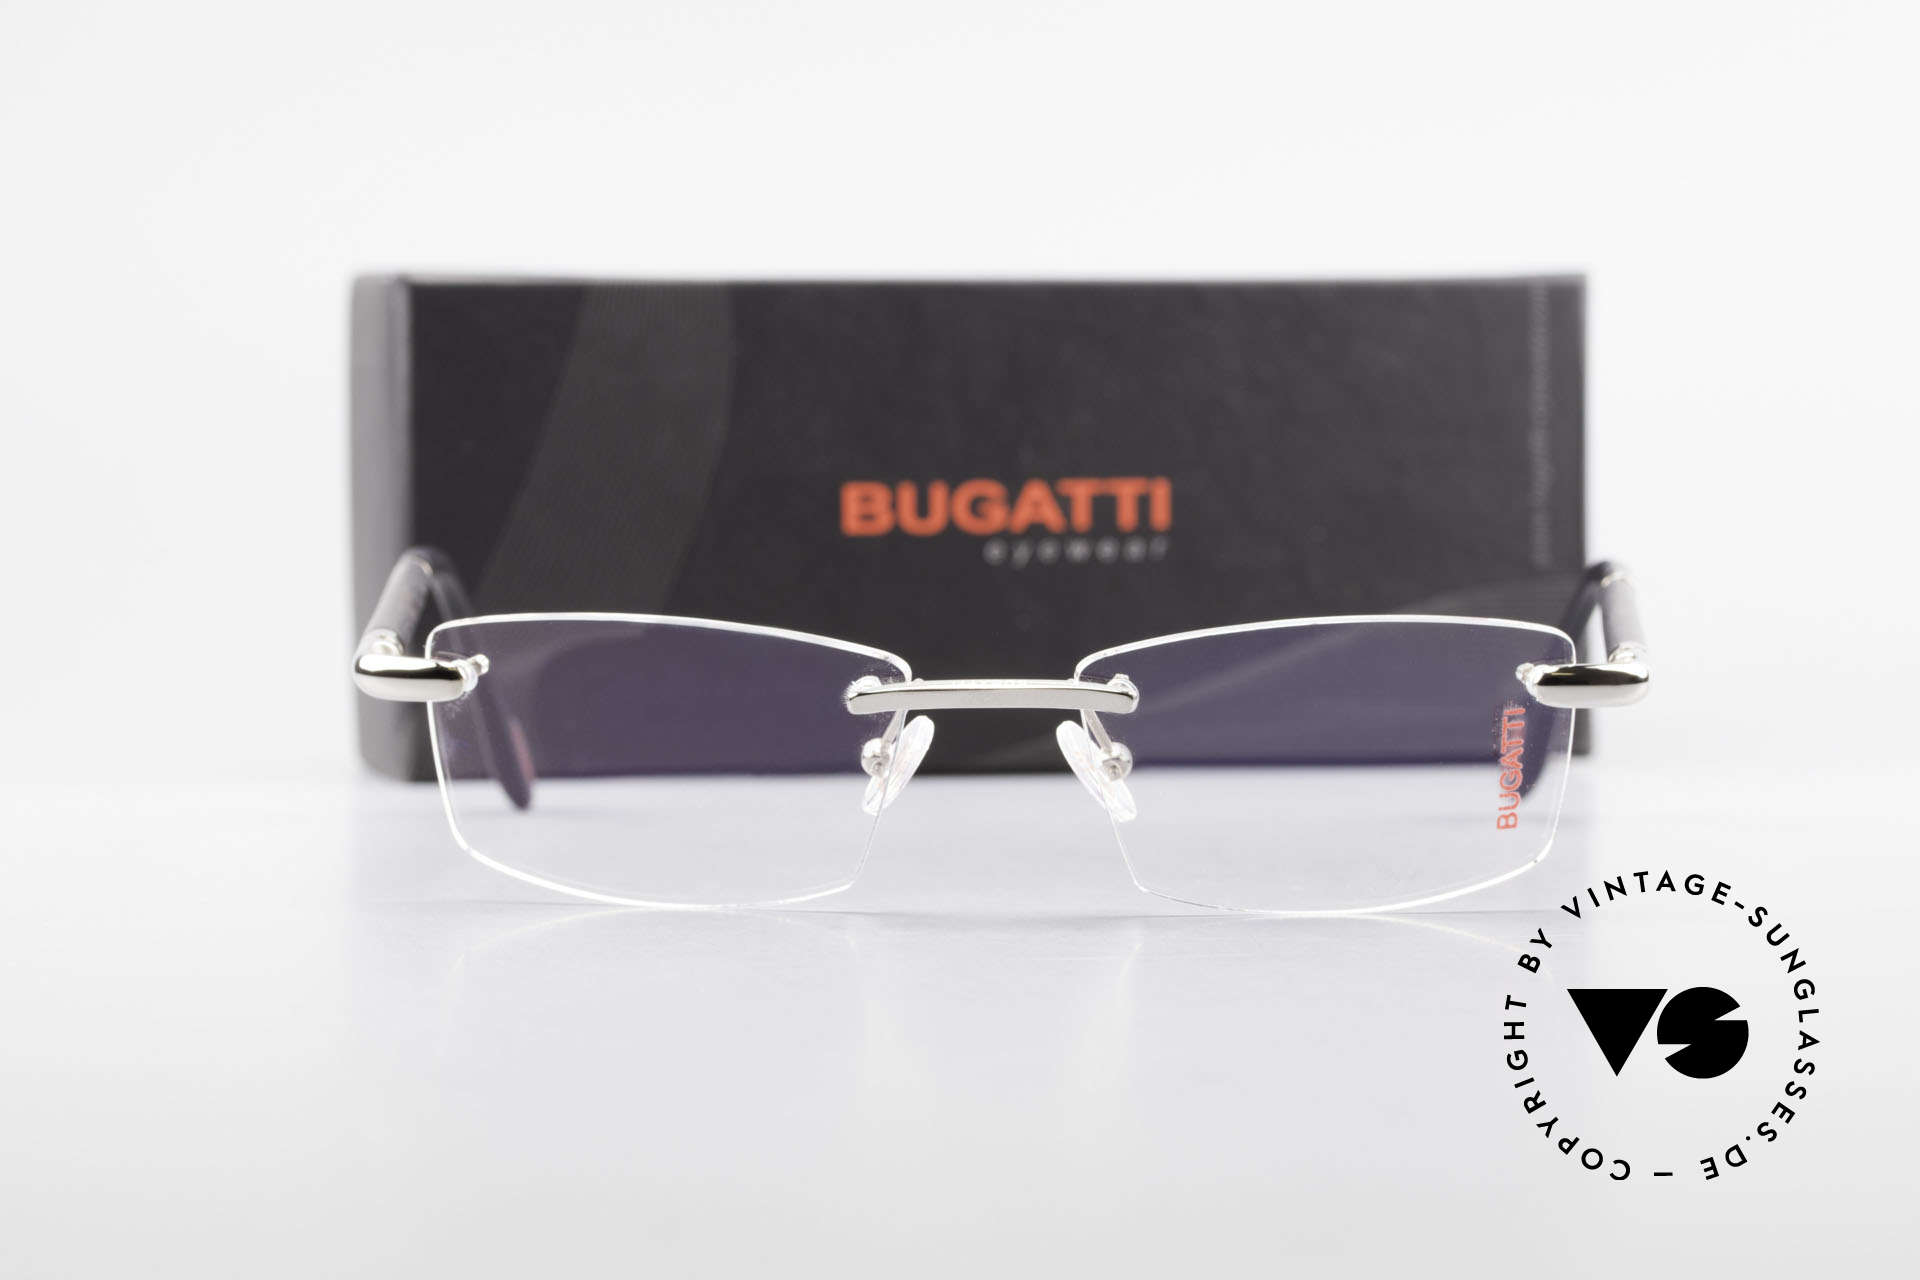 Bugatti 545 White Gold And Genuine Horn, Size: medium, Made for Men